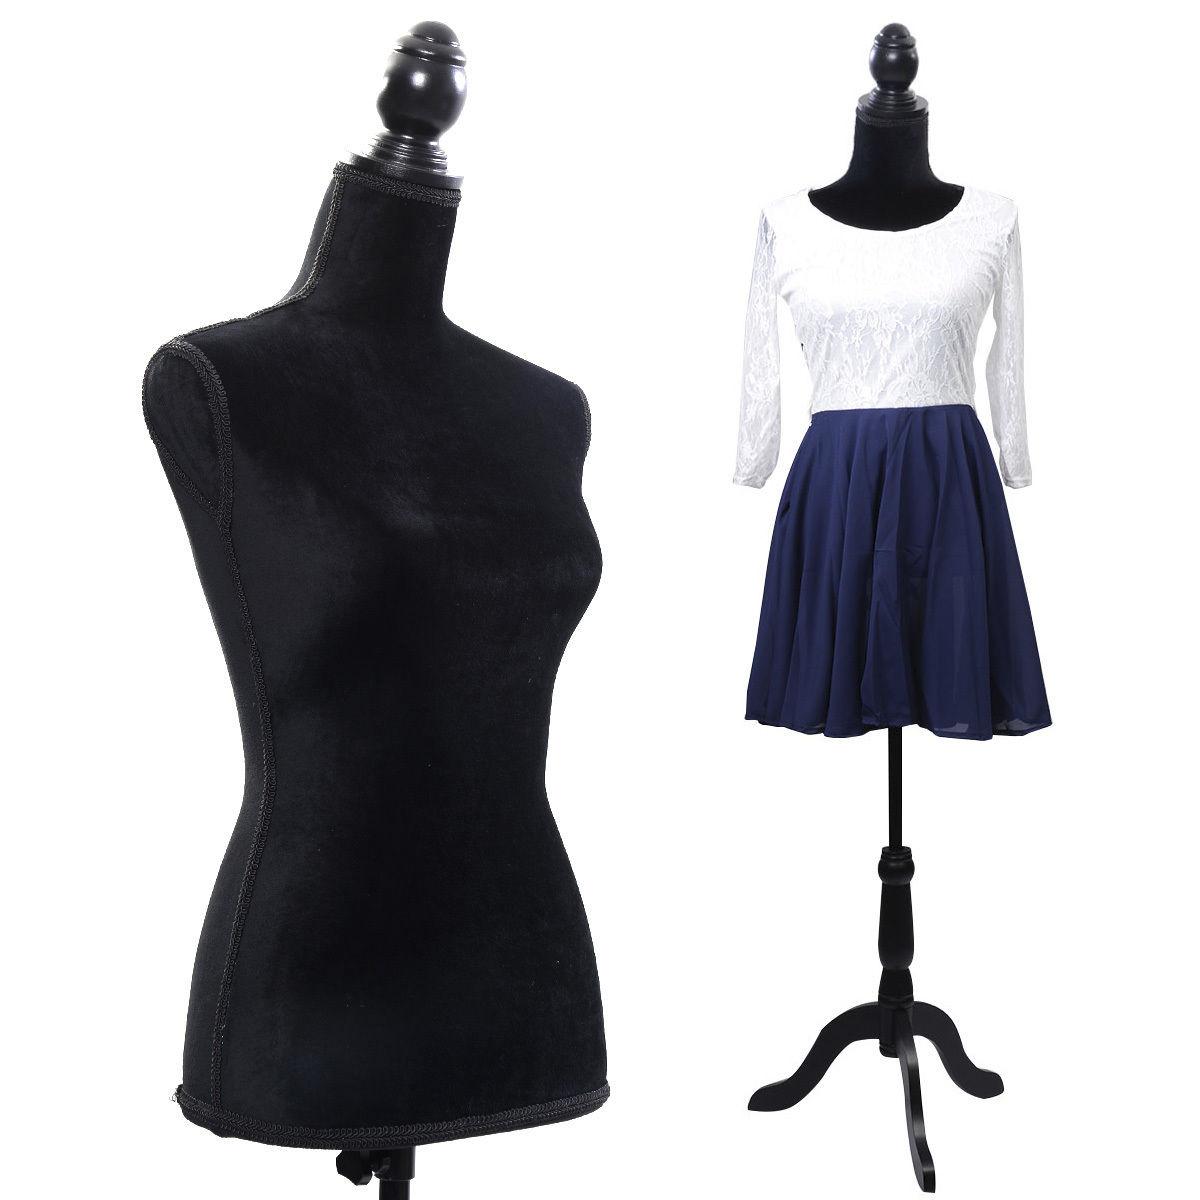 Costway Black Female Mannequin Torso Dress Form Display W/ Black Tripod Stand